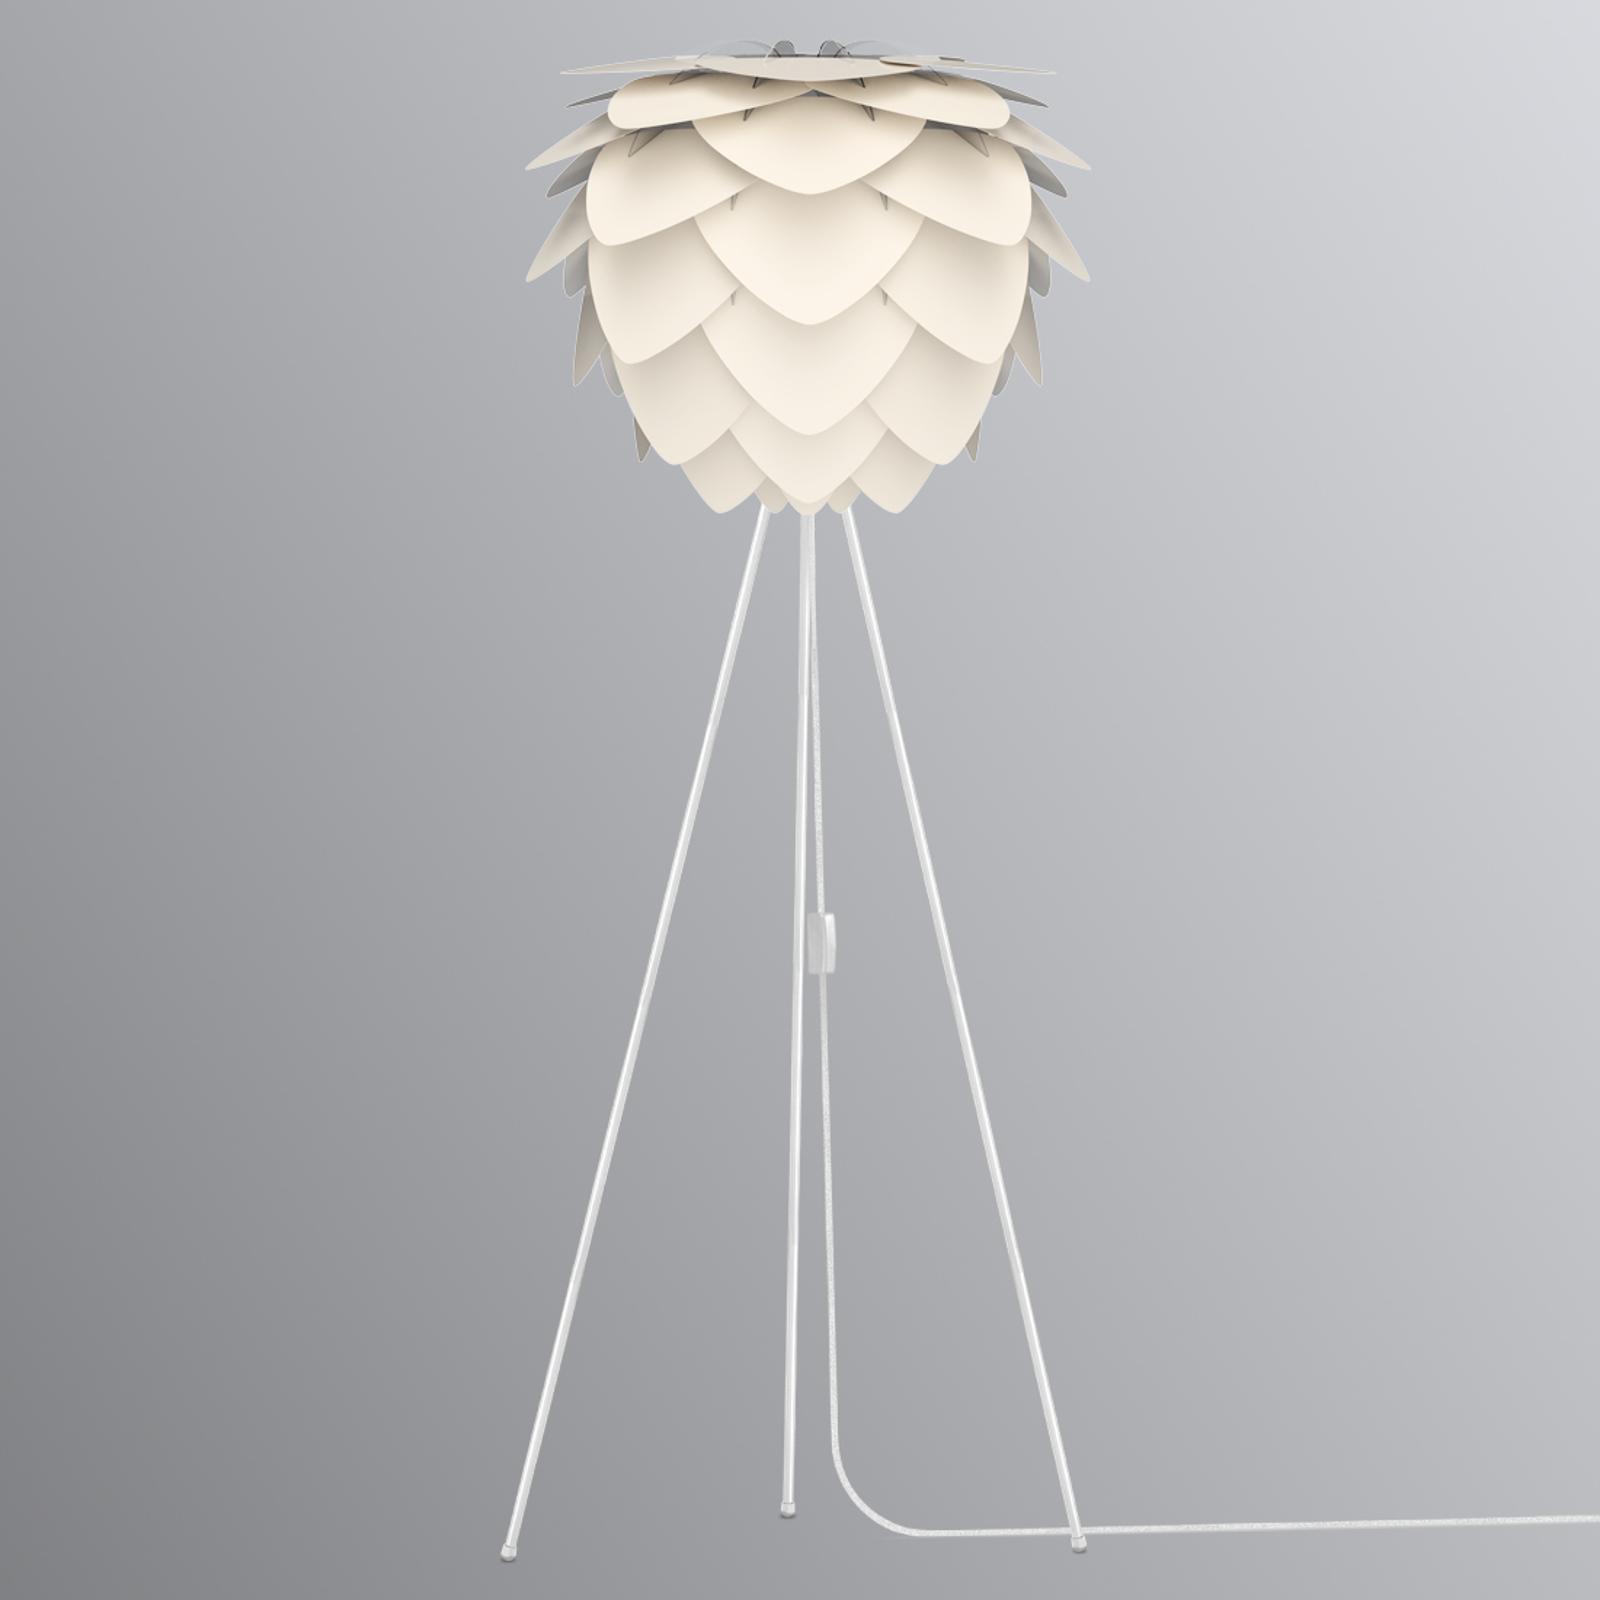 Trebent stomme vit – golvlampa Aluvia pärlemor